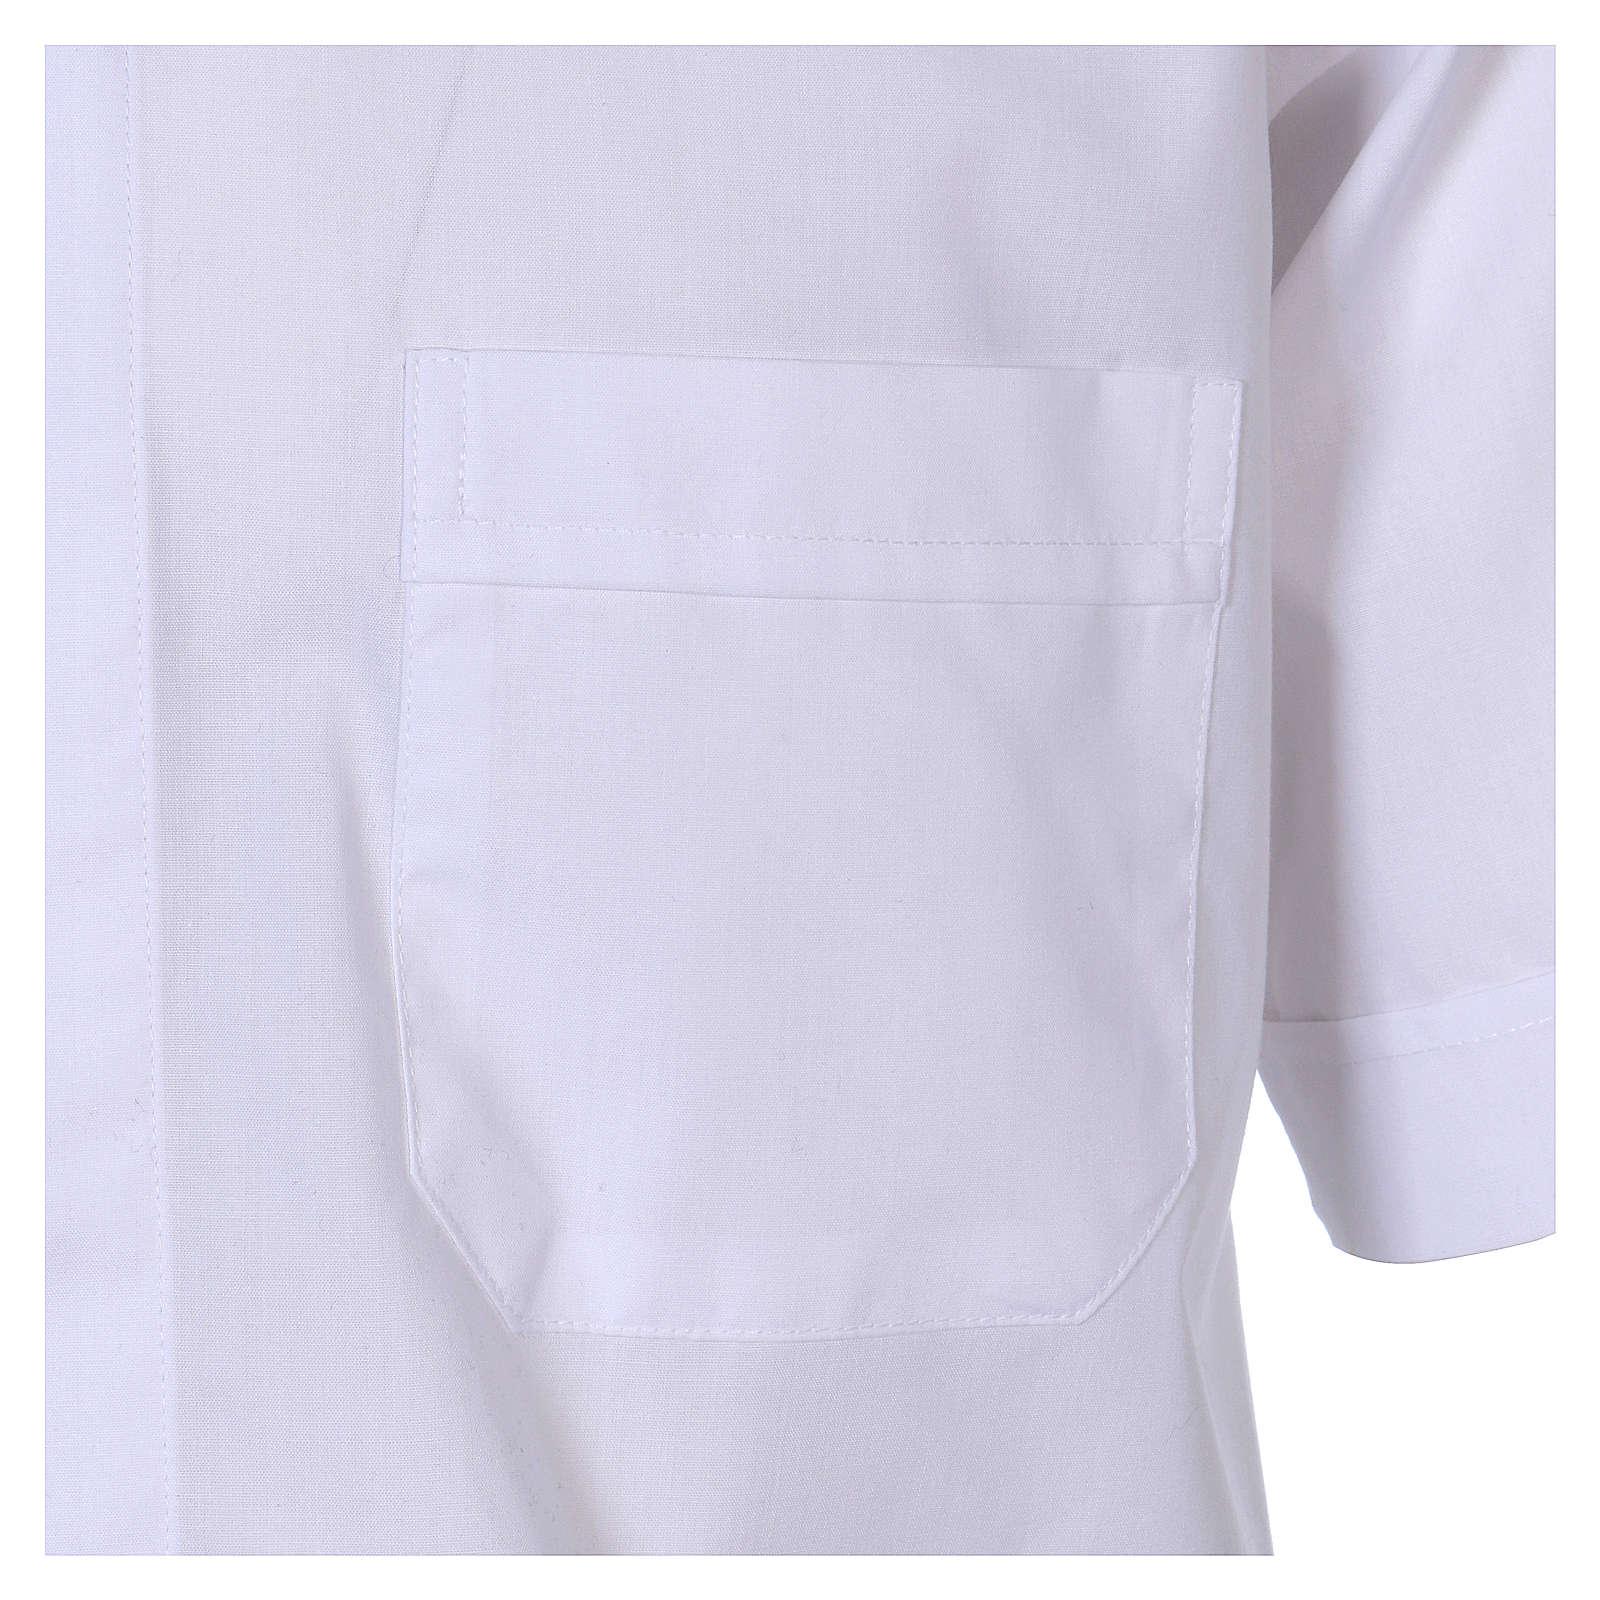 Chemise Clergyman manches courtes tissu mixte coton blanc In Primis 4